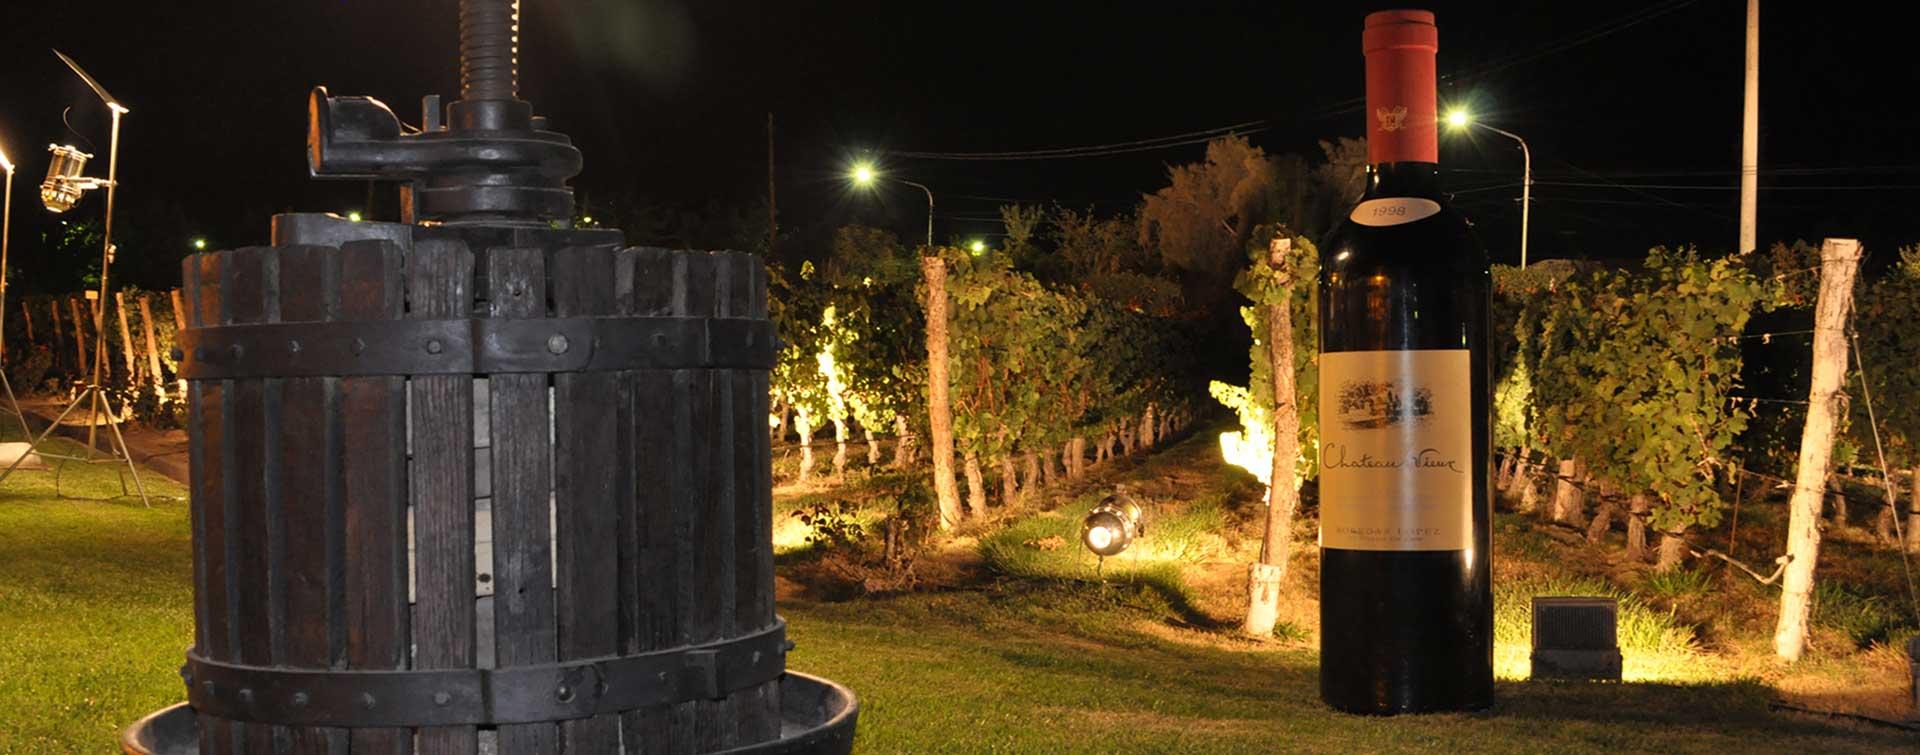 2 jardin